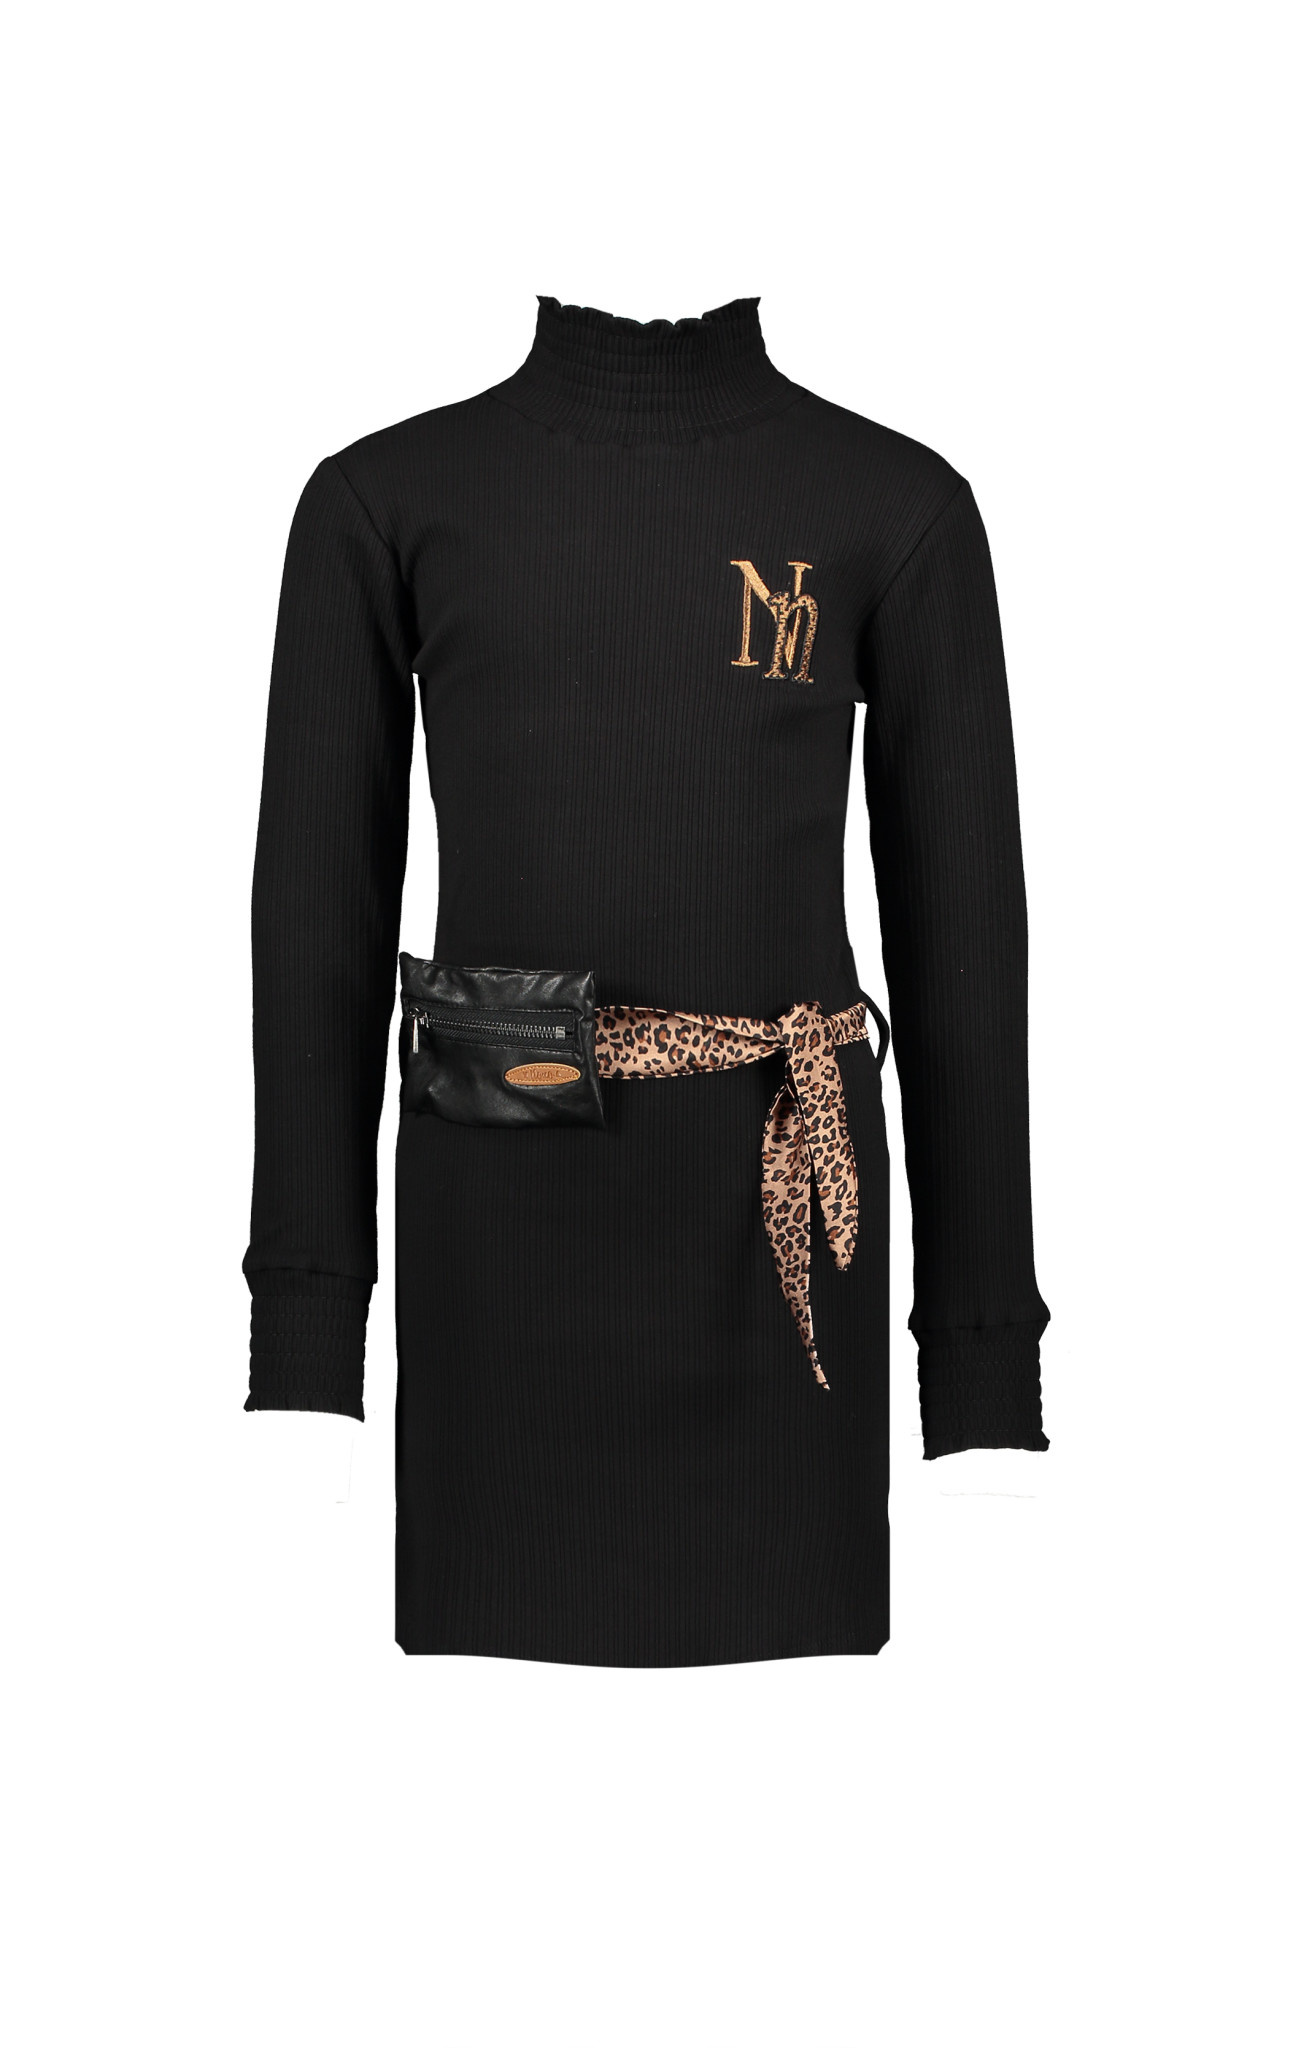 Molan Dress with Leopard Print Tie